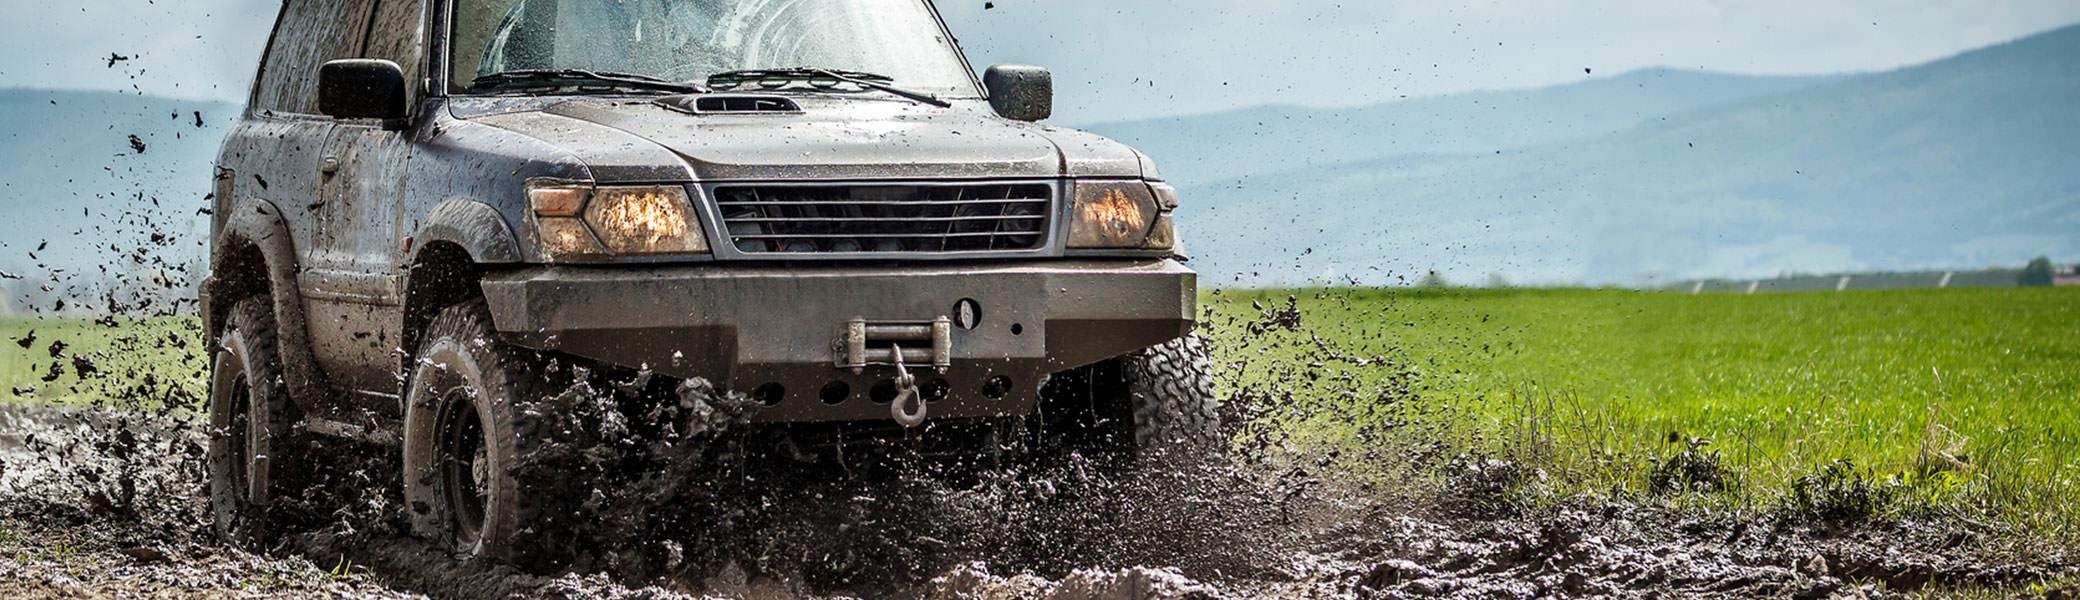 Truck splashing through the mud